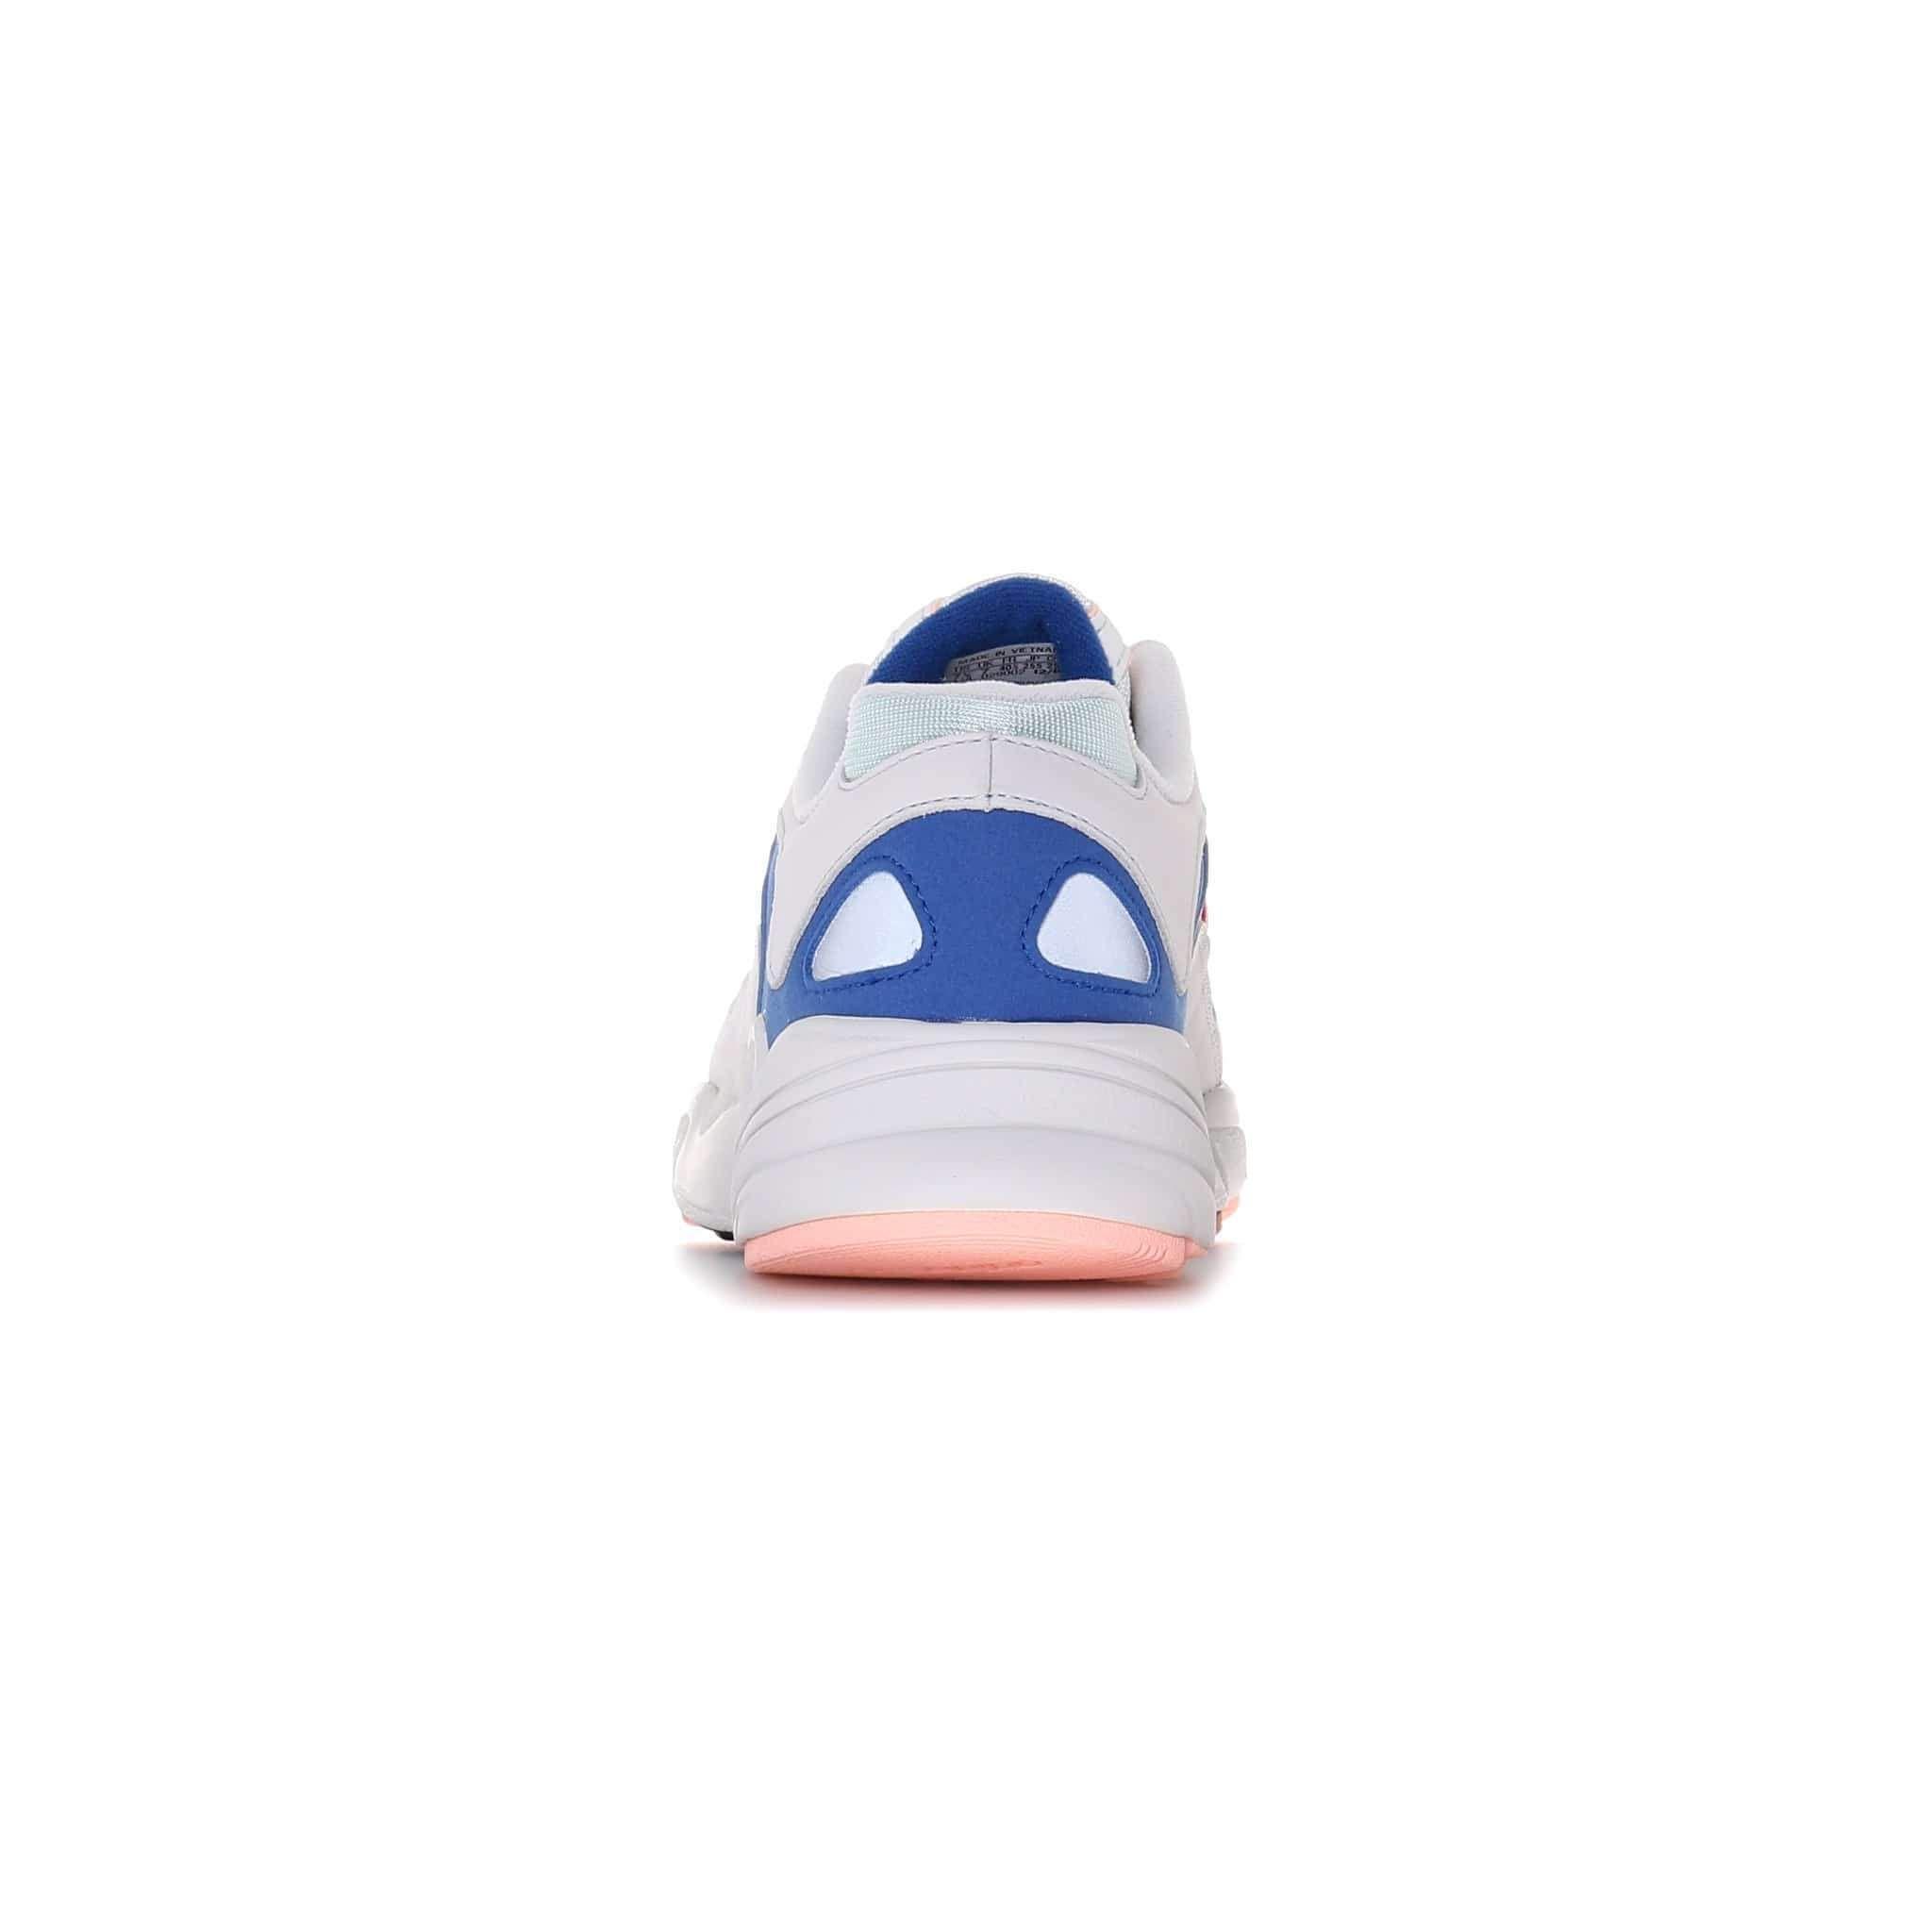 Adidas Originals Yung 1 Crystal White Clear Orange